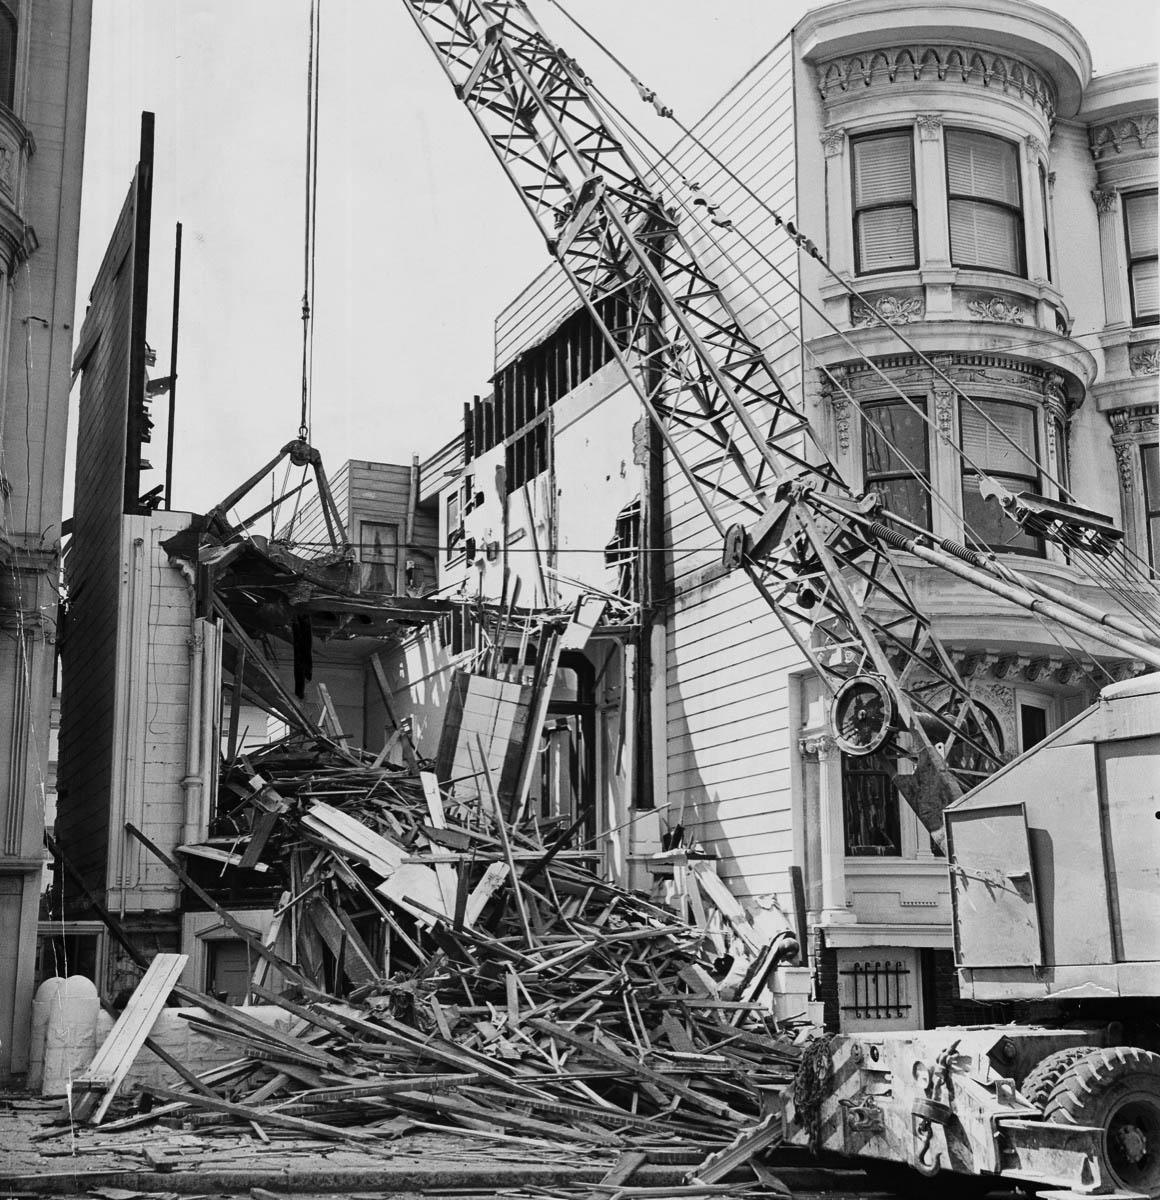 Demolishing the California Dream: How San Francisco Planned Its Own